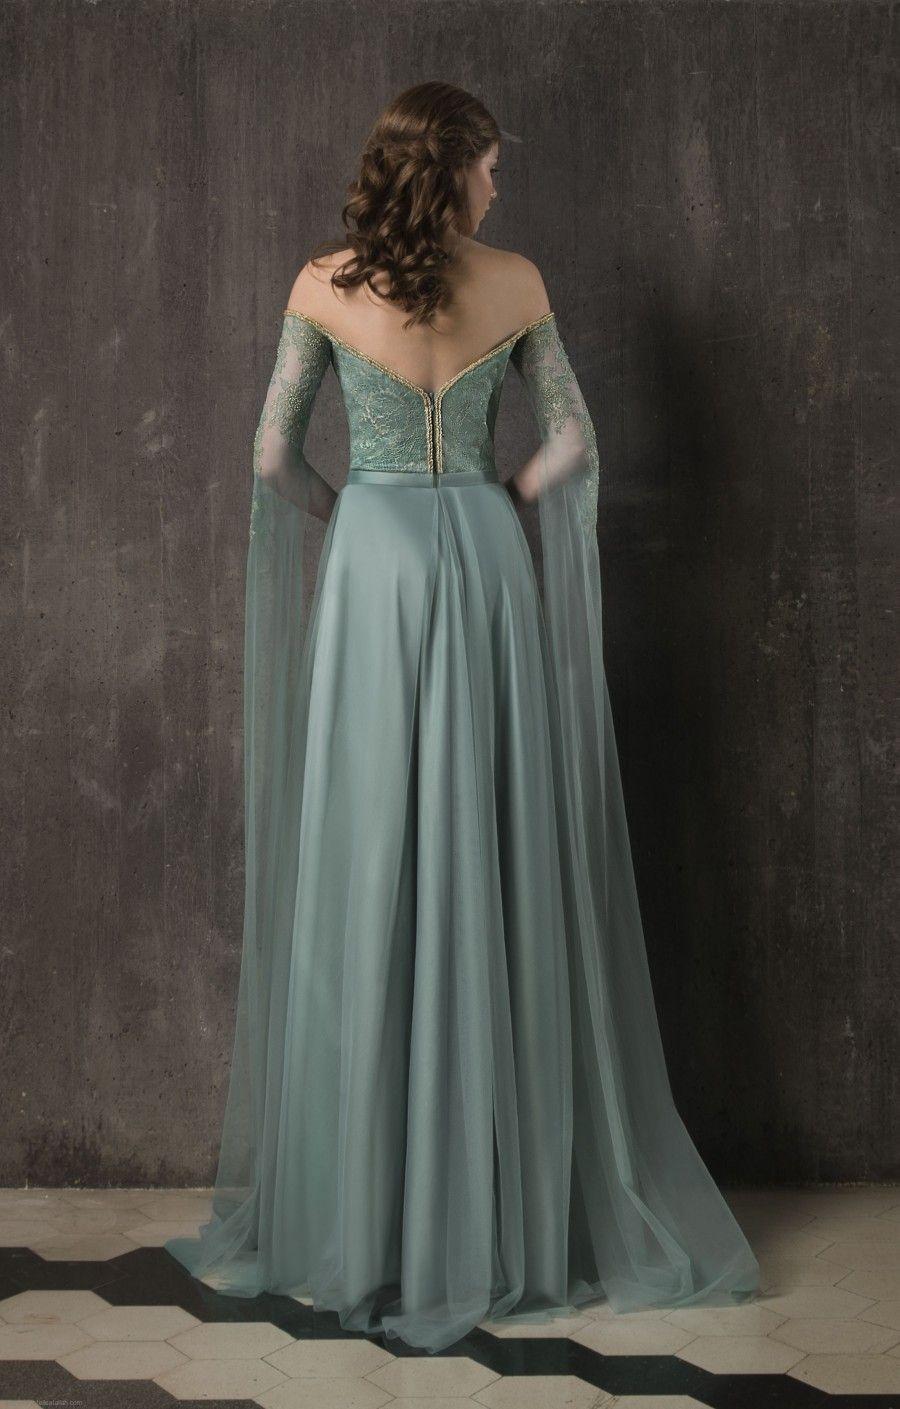 Pin By Posto Kakica On Lebanese Fashion Chrystelle Atallah Fantasy Gowns Dresses Pretty Dresses